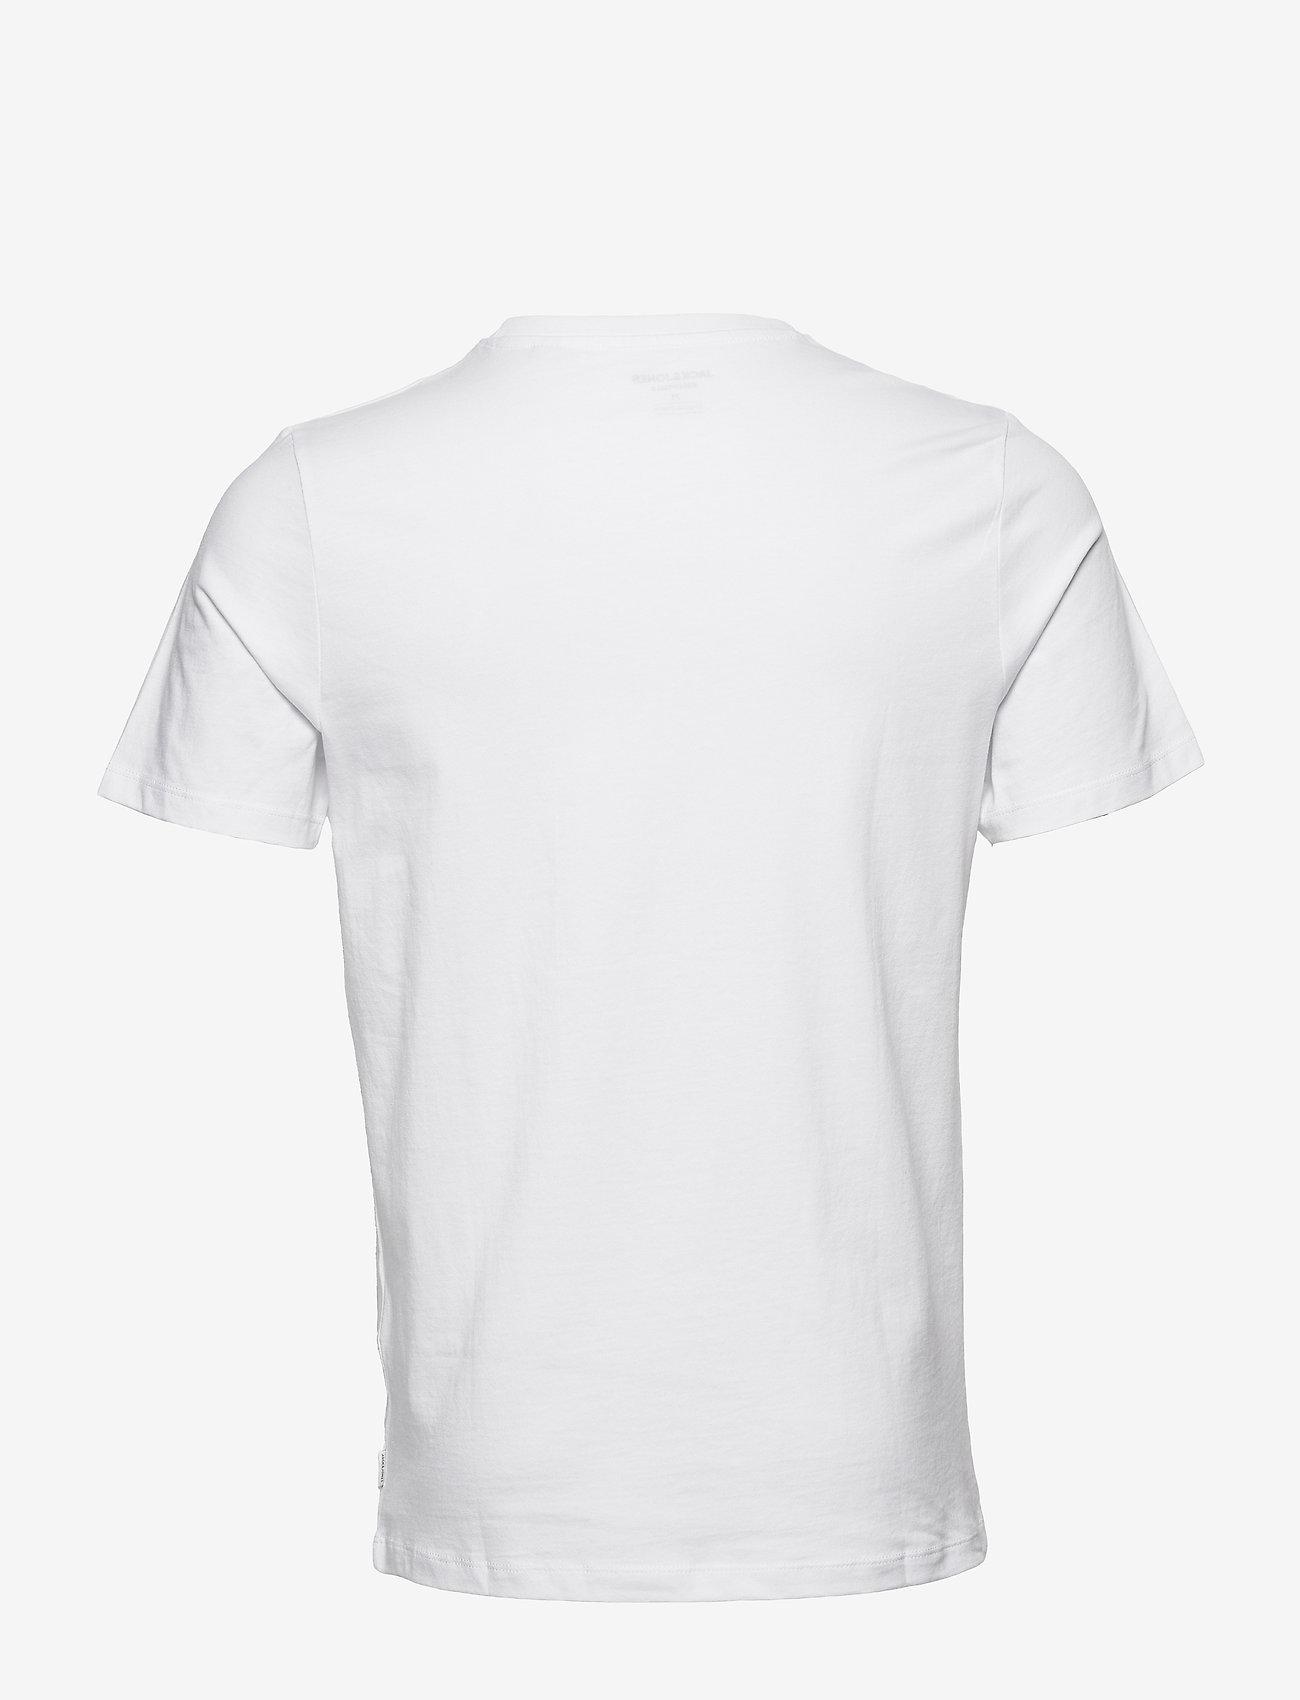 Jack & Jones - JJEORGANIC BASIC TEE SS O-NECK 3PK MP - basic t-shirts - black - 1